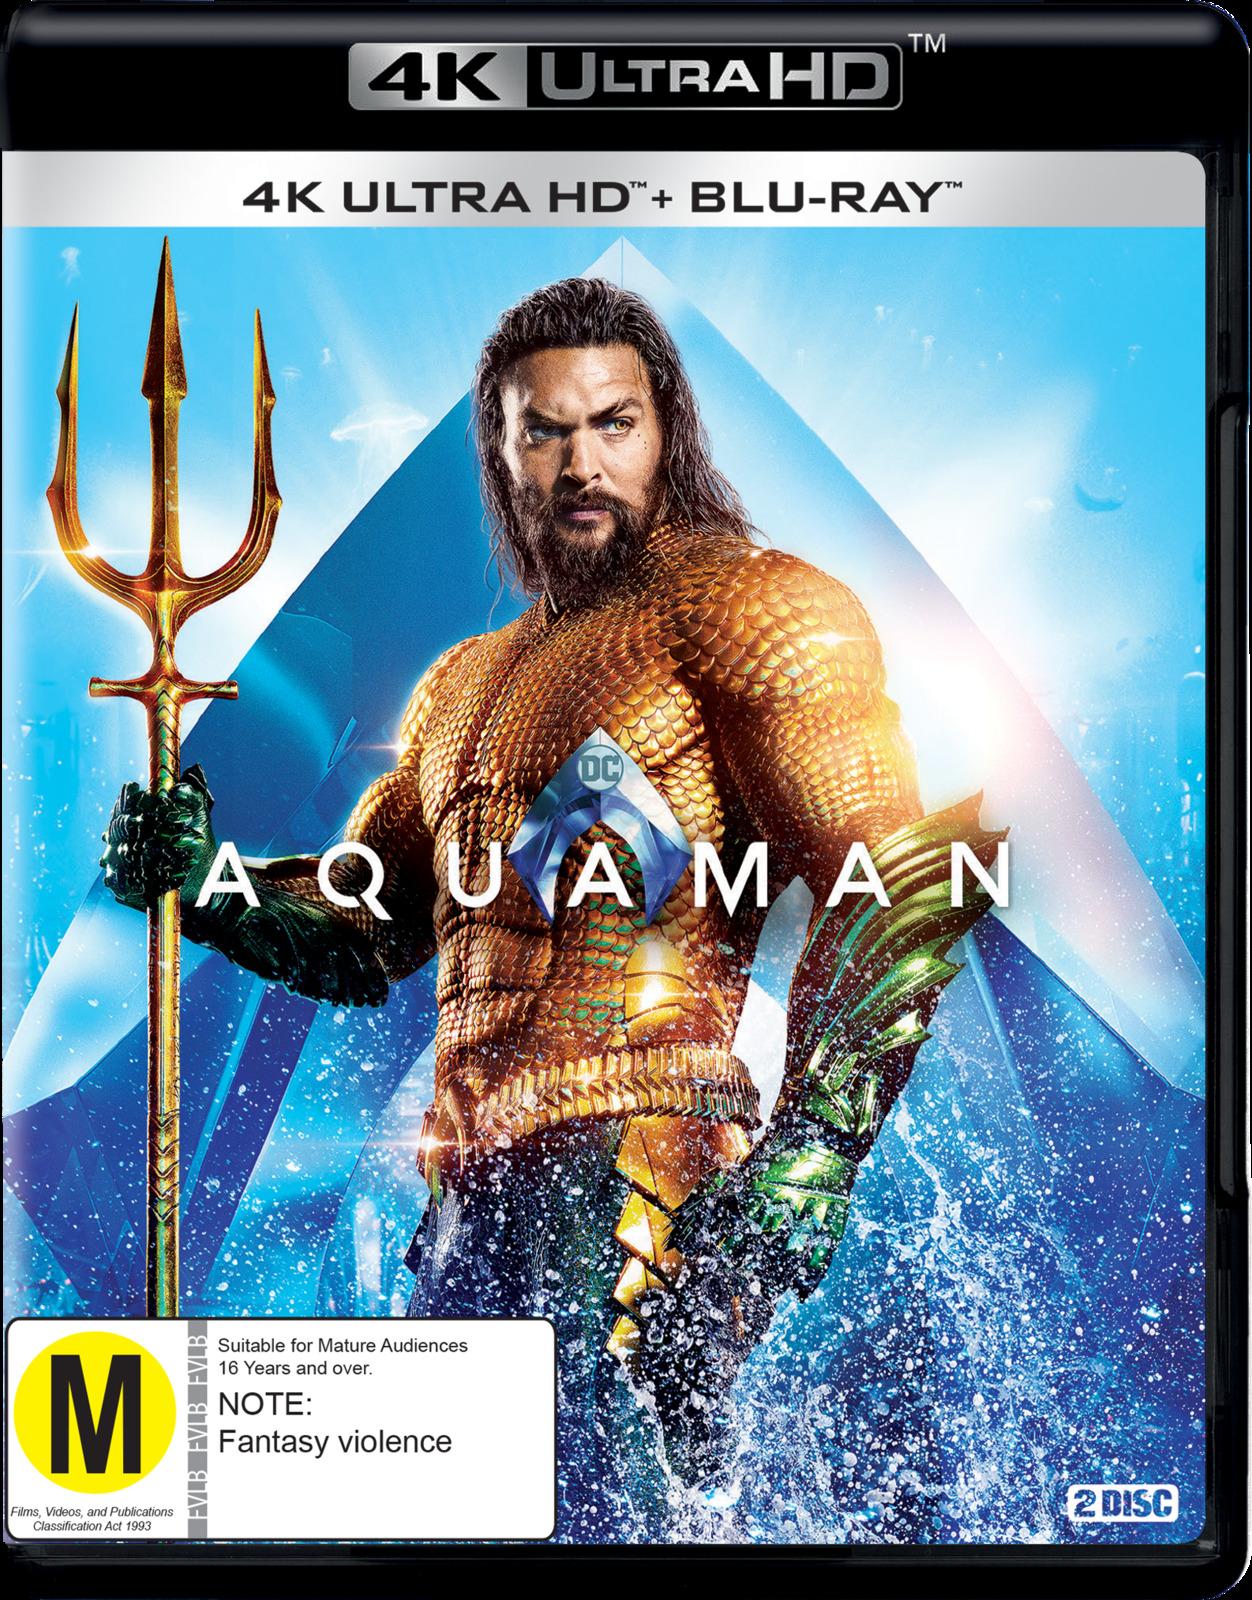 Aquaman on Blu-ray, UHD Blu-ray image